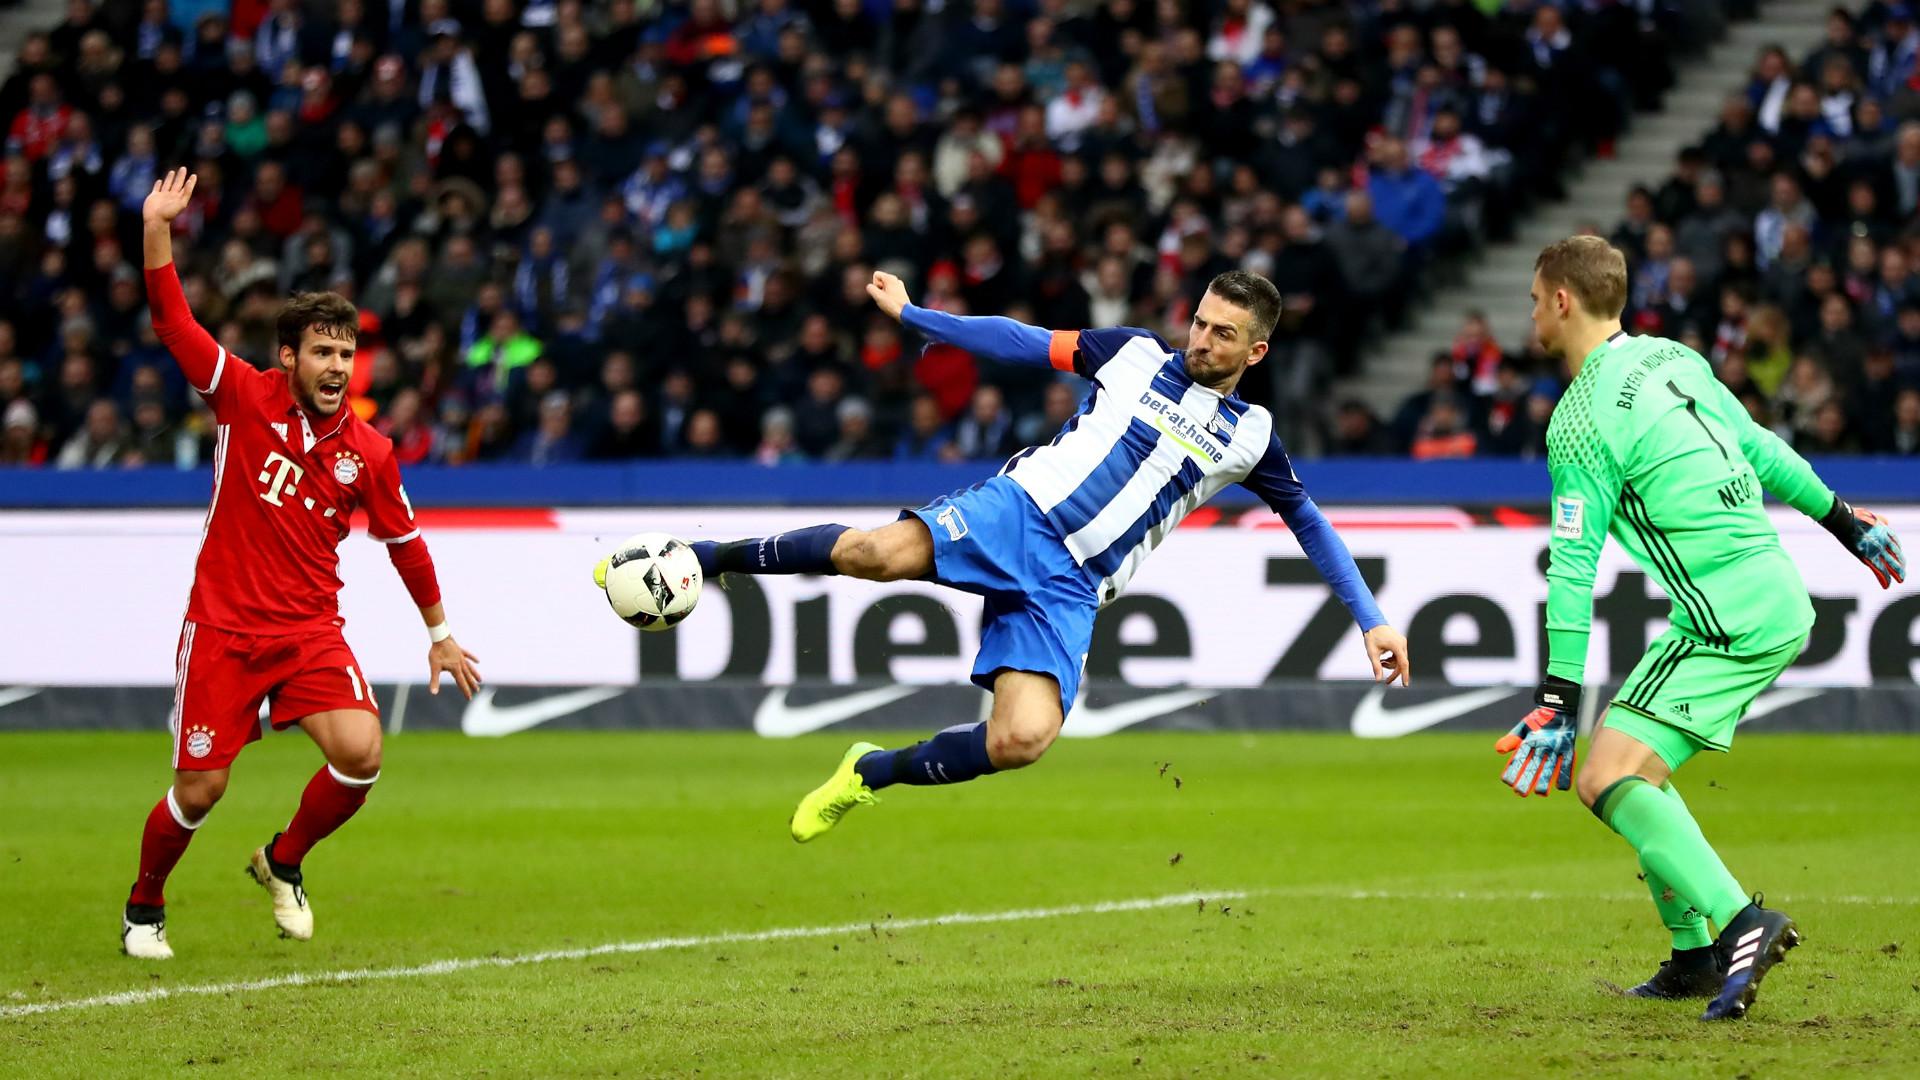 Vedad Ibisevic Hertha BSC Bundesliga